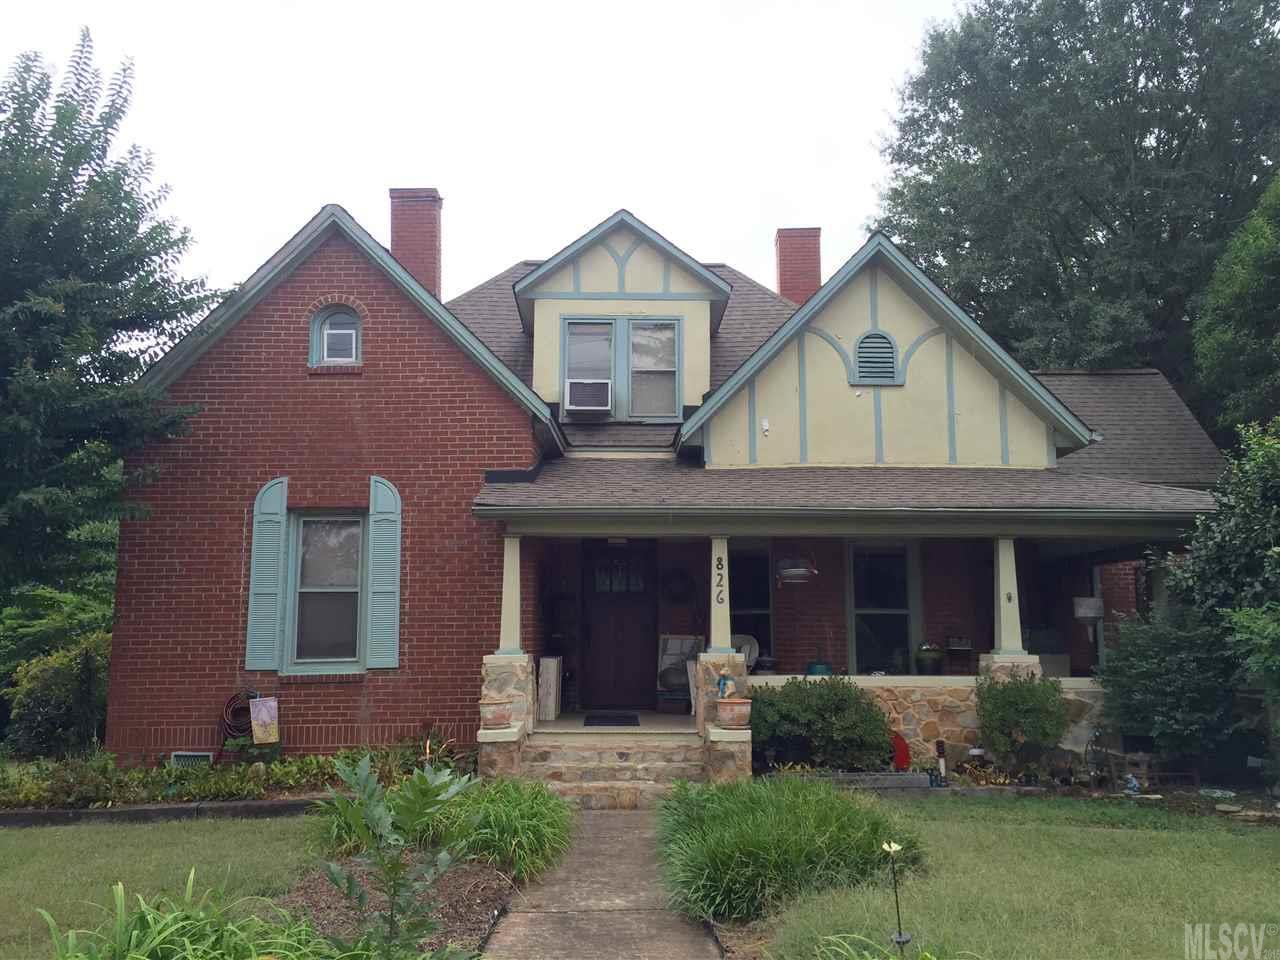 826 8th St Ne, Hickory, NC 28601